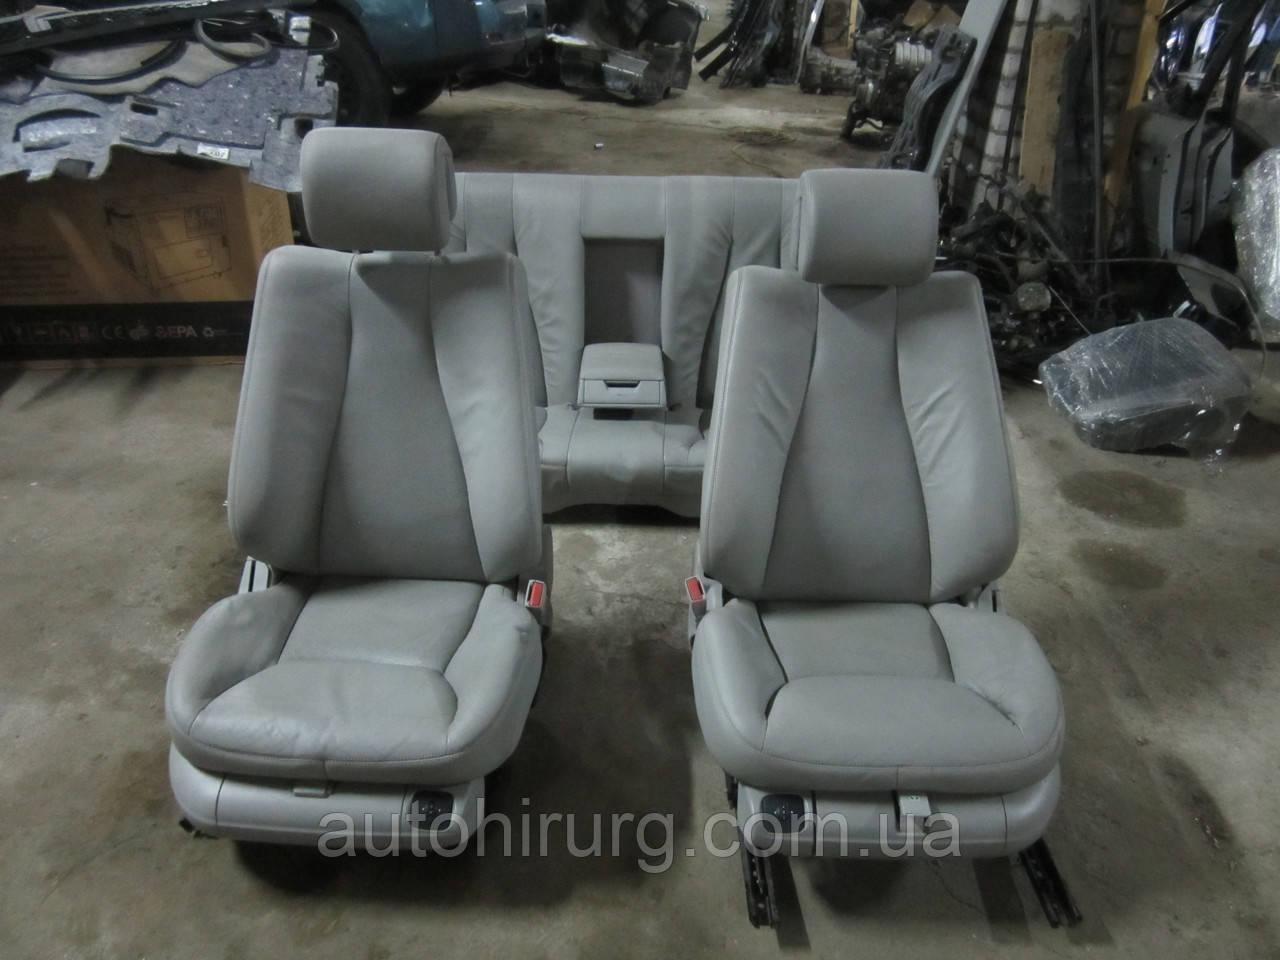 Кожаный салон (серый) MERCEDES-BENZ W220 s-class, фото 1